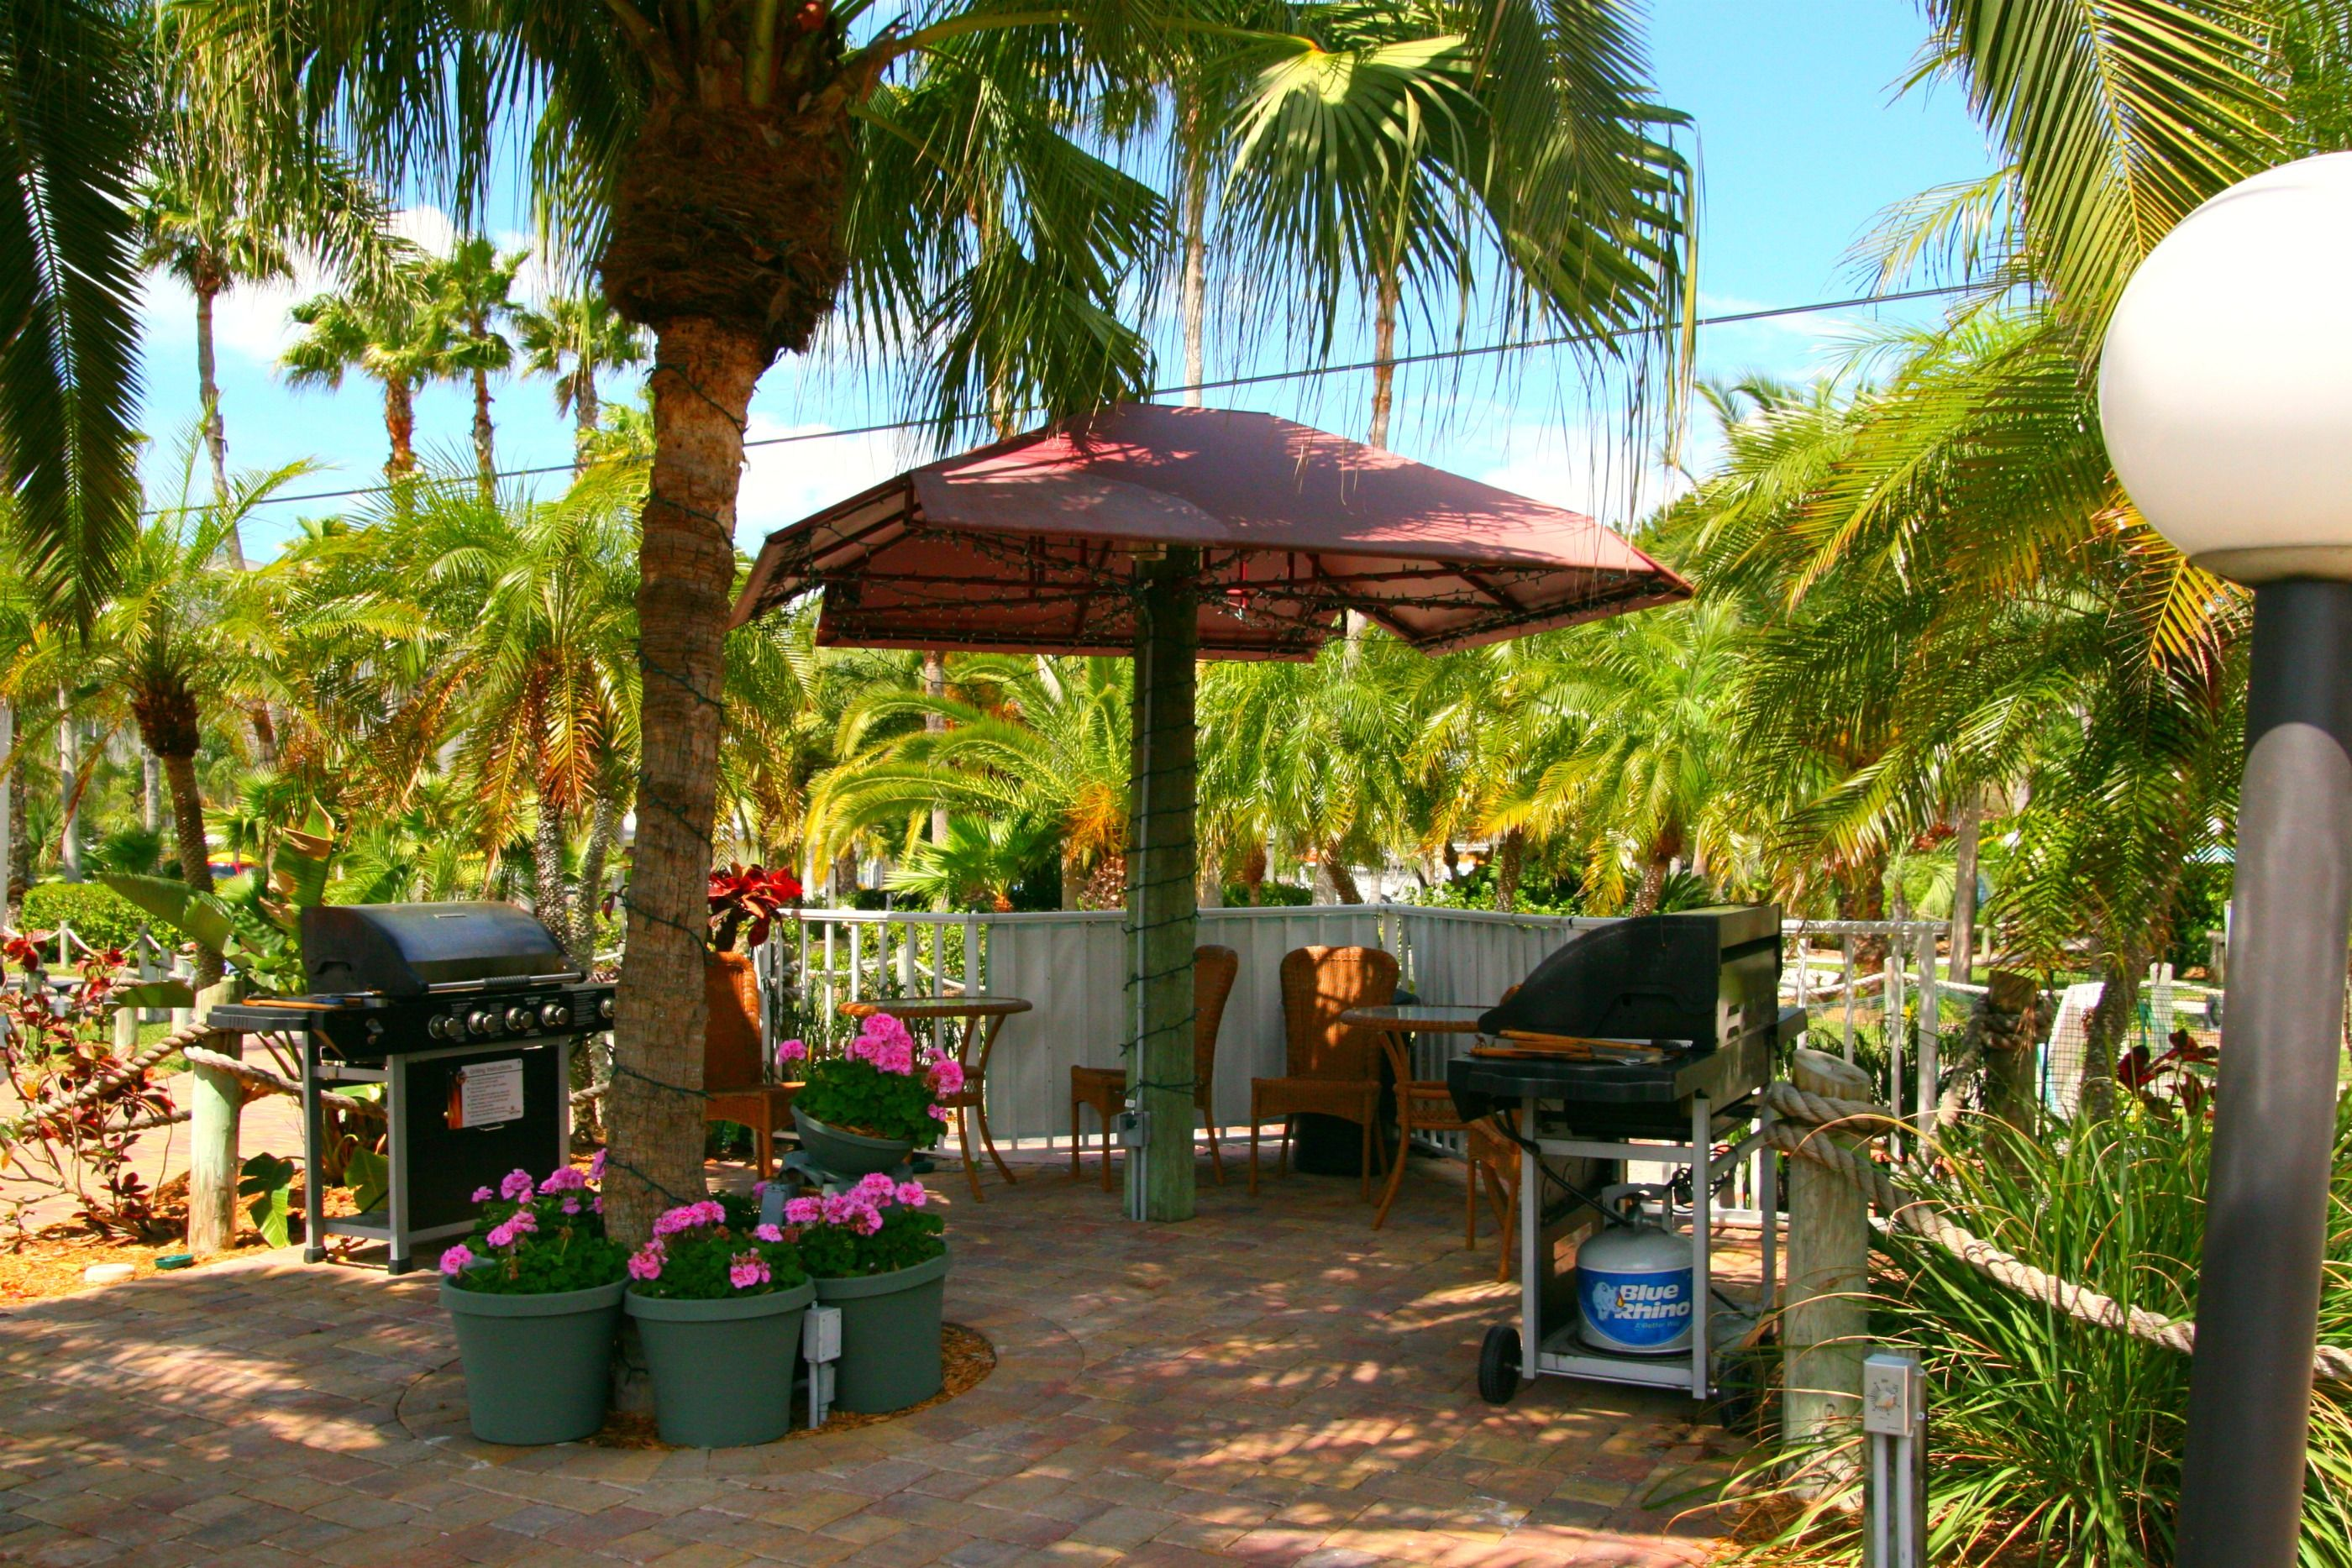 Tropical Gardens and BBQ Tiki Huts | Soriano Family Reunion ...